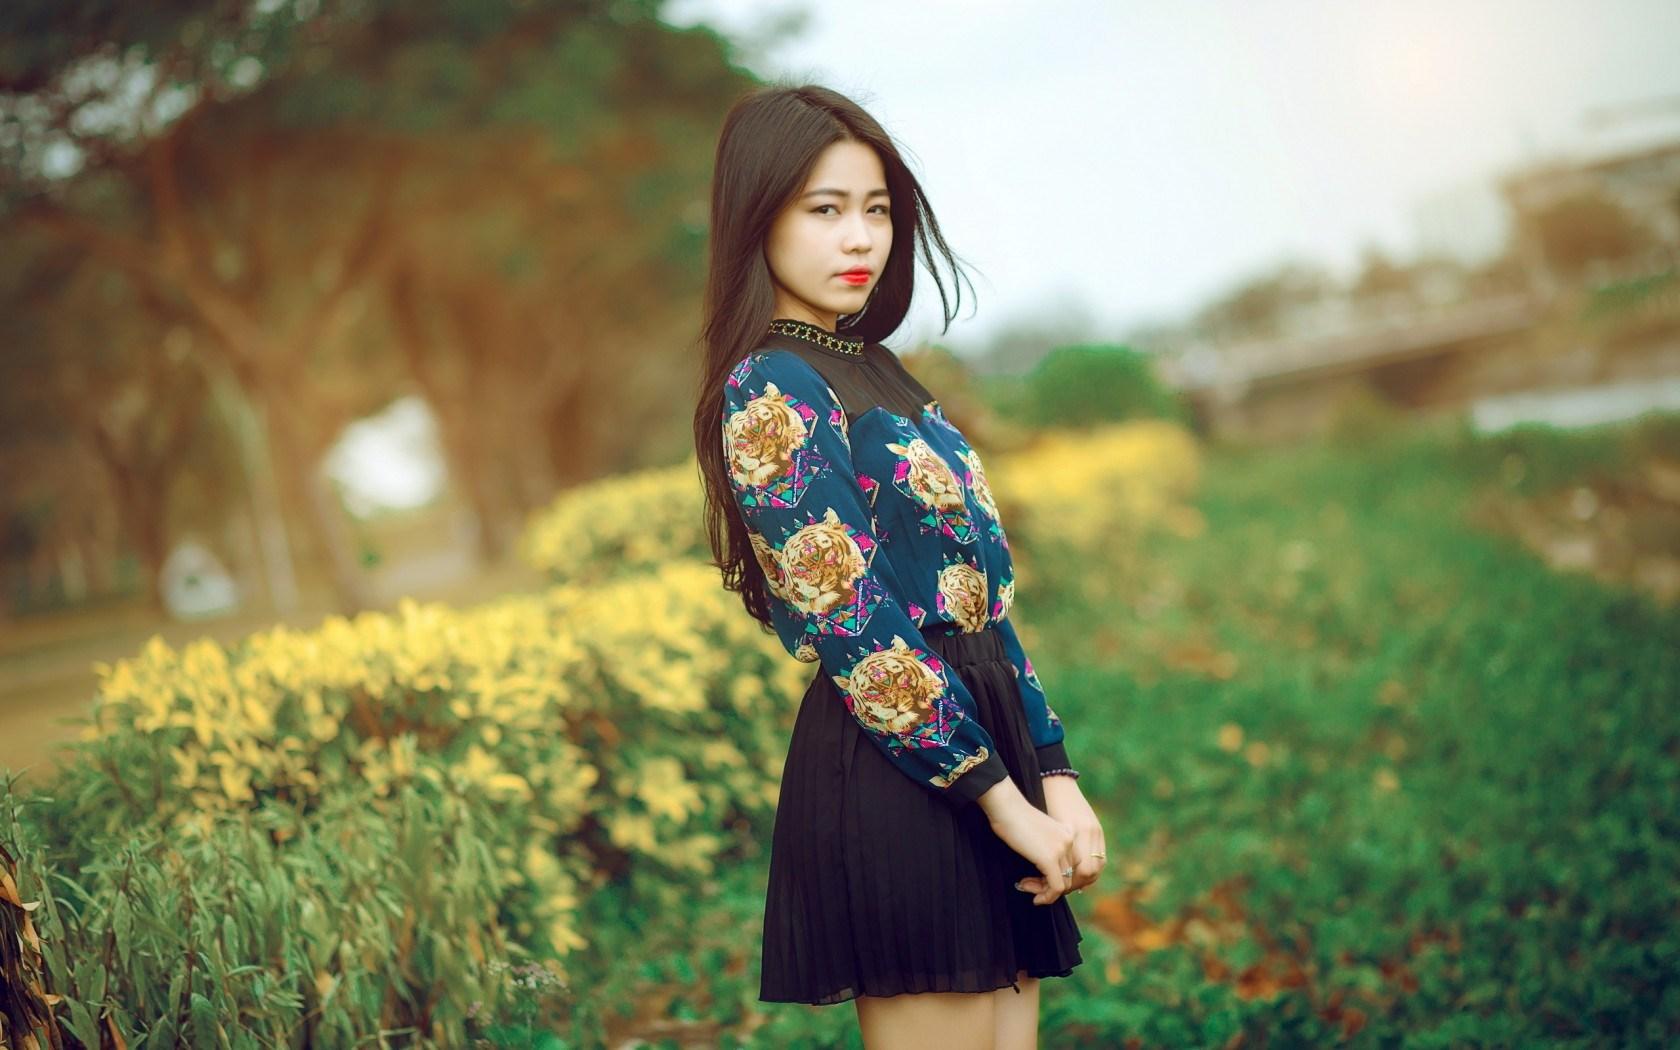 Fashion Model Girl Asian